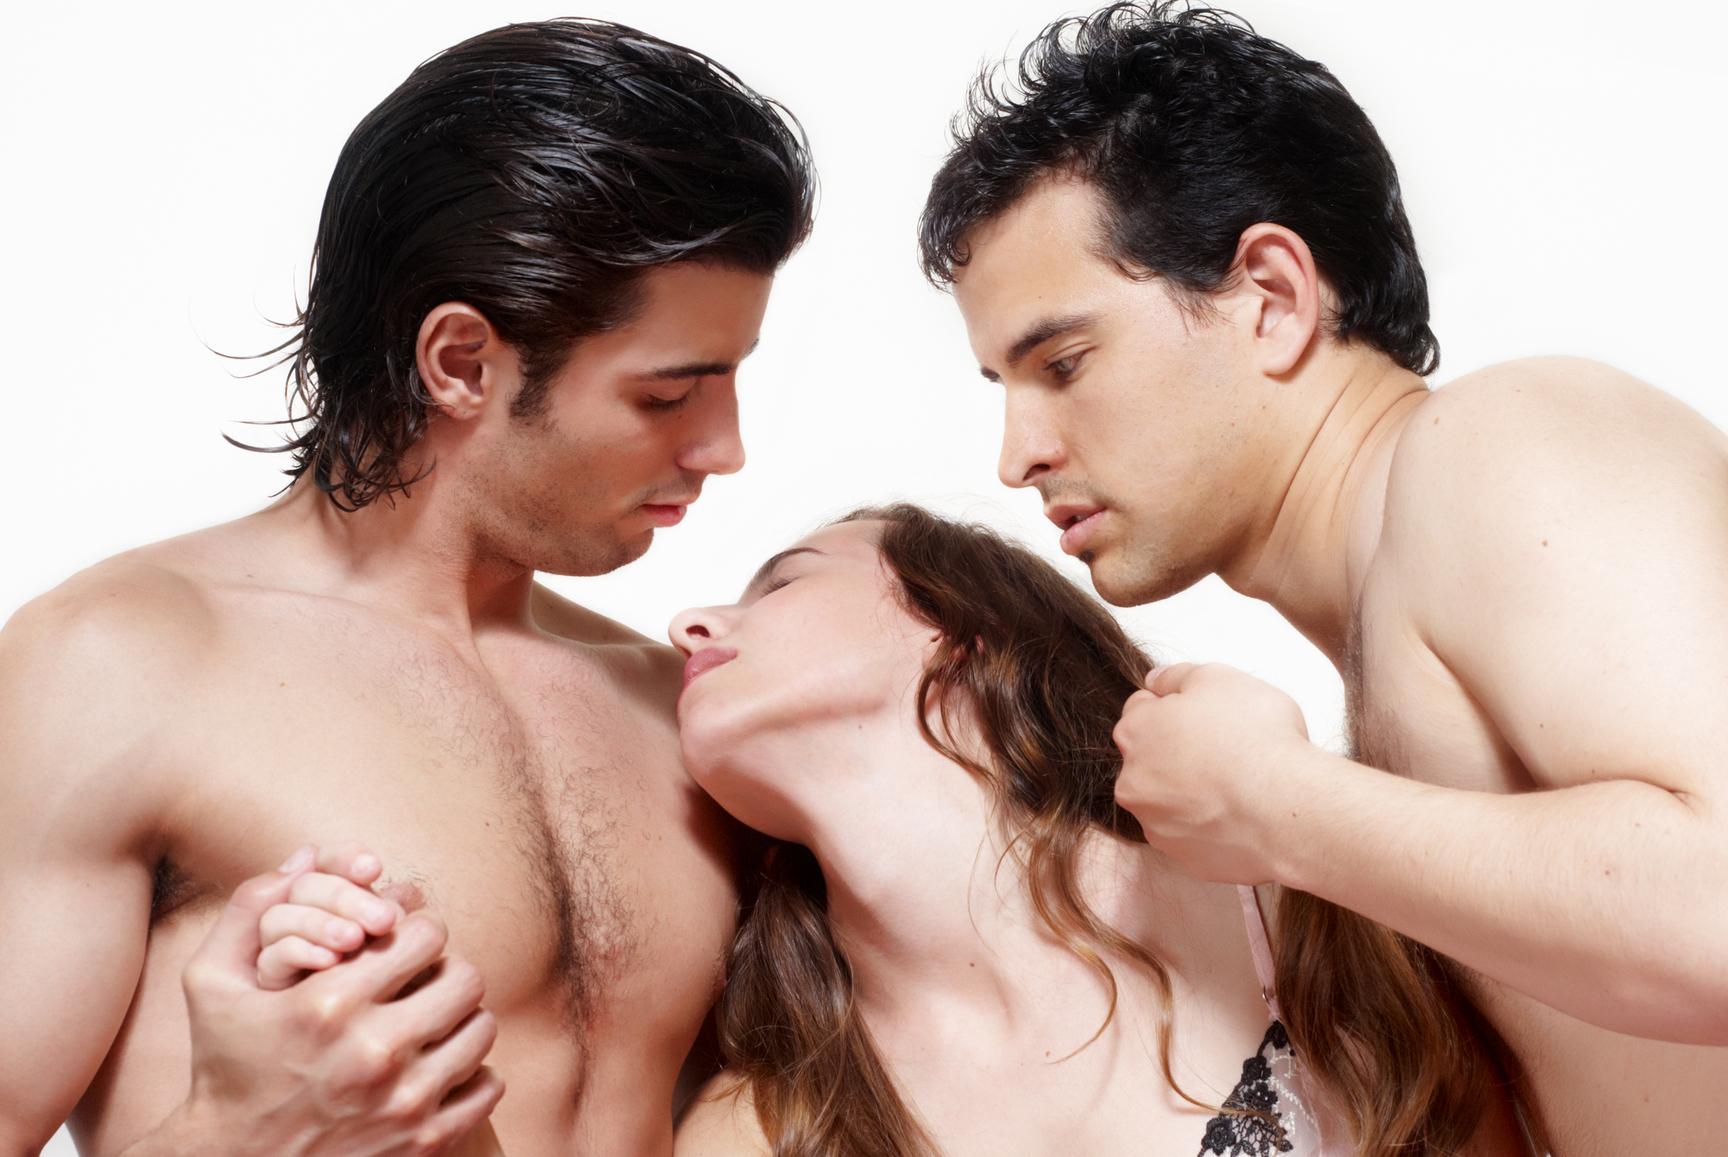 muzhskie-istorii-seksualnie